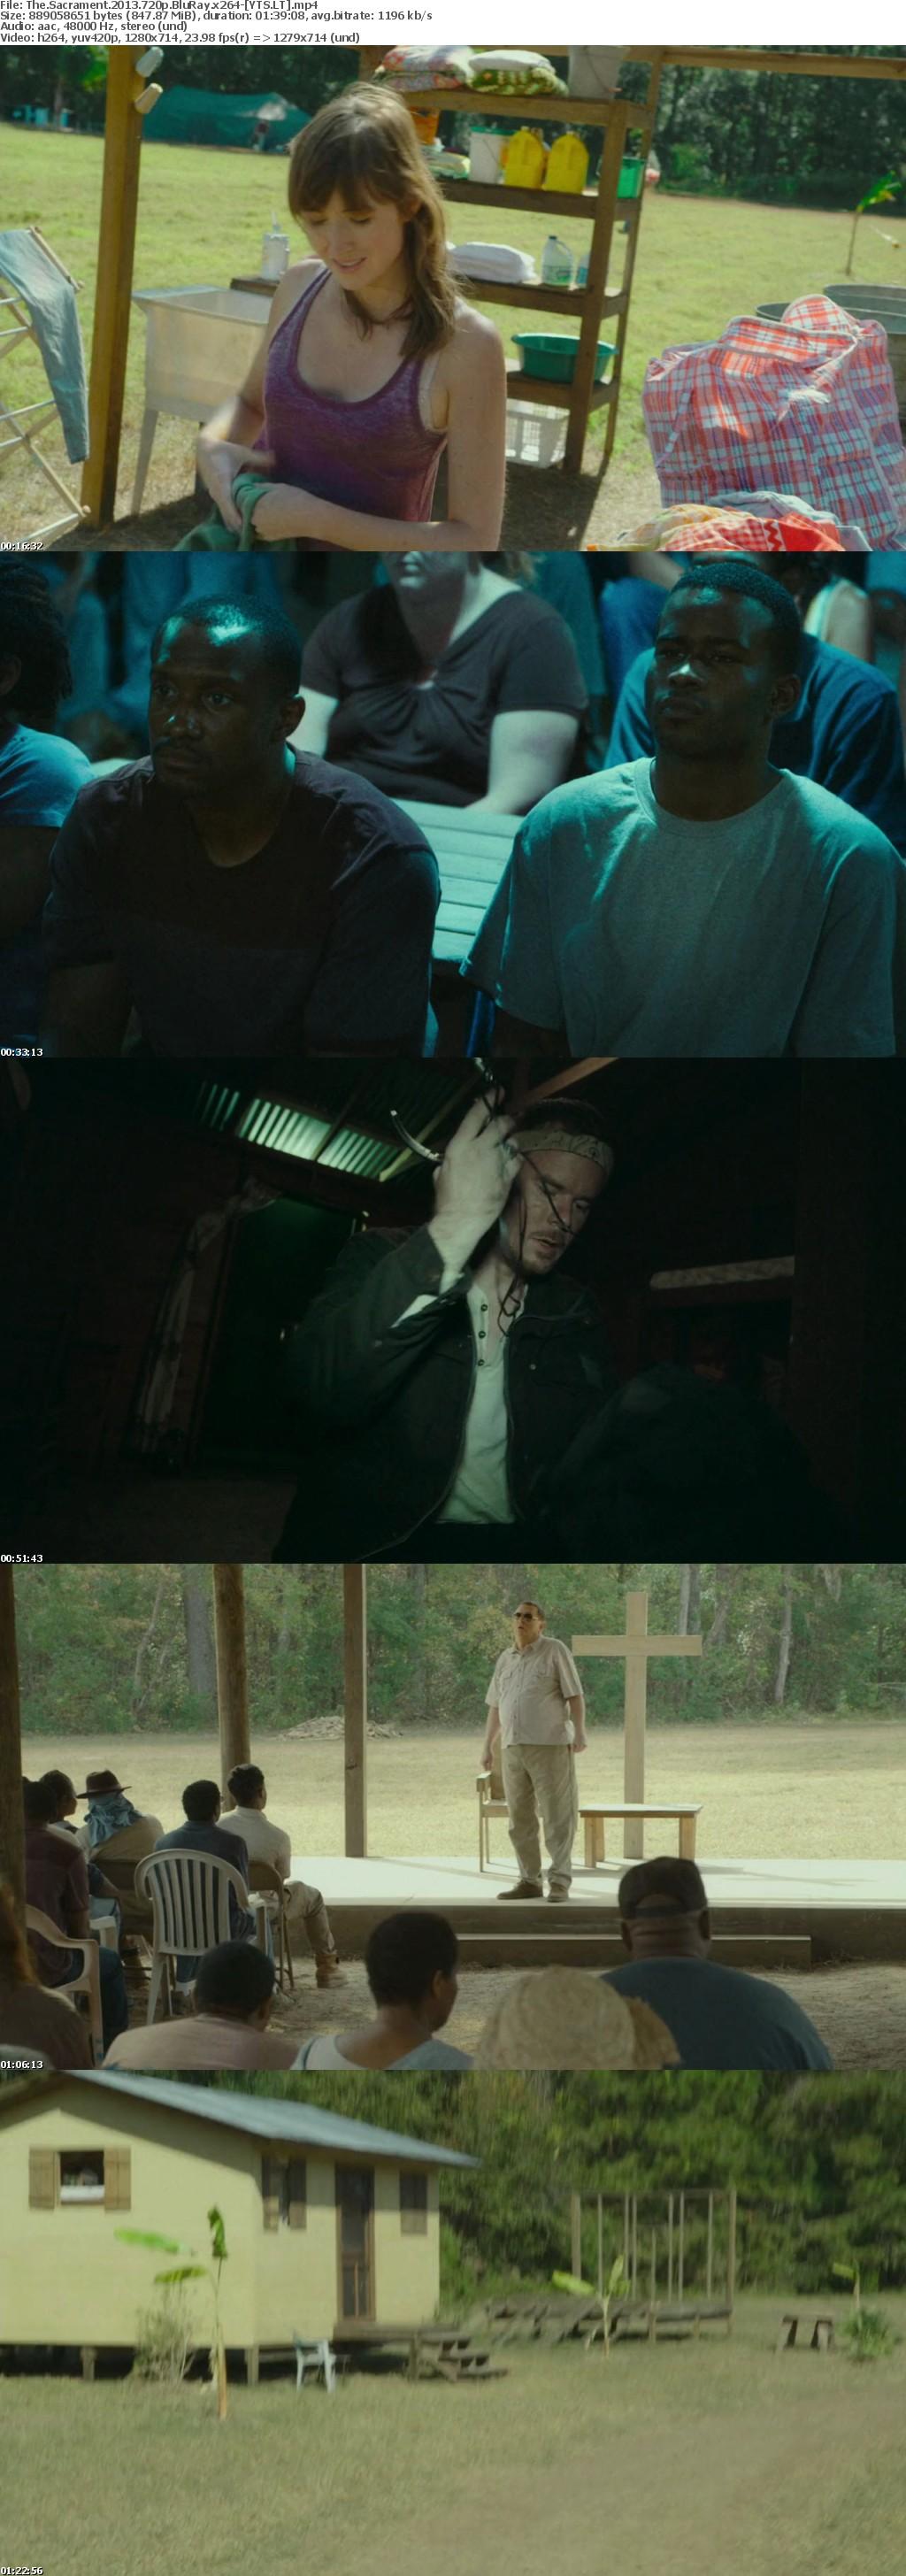 The Sacrament 2013 [BluRay] [720p] YIFY